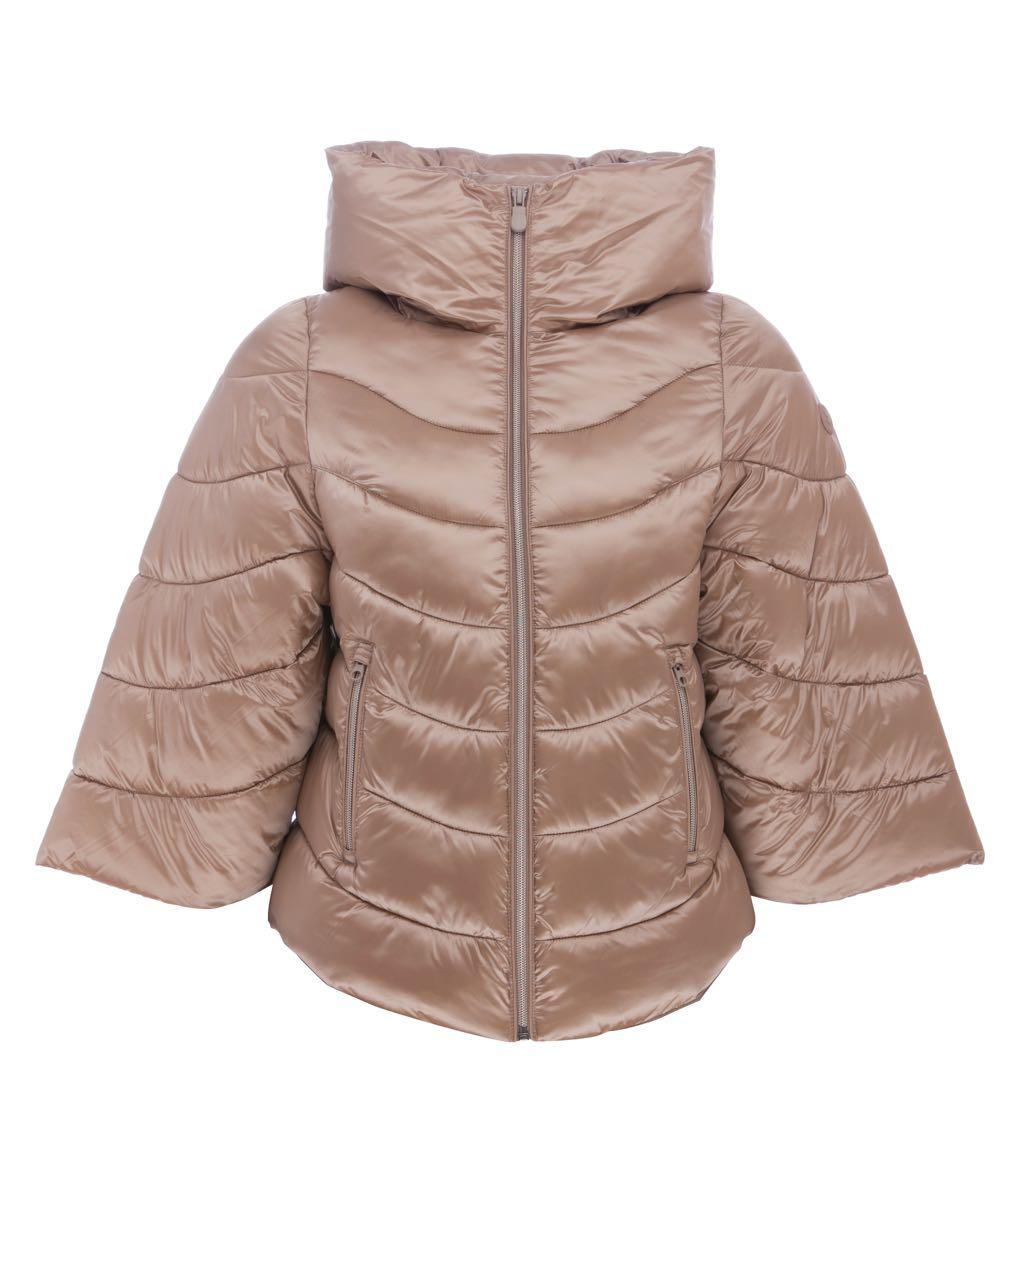 Save The Duck Short Jacket S3594W-IRIS5 Macaroon Beige Ontario